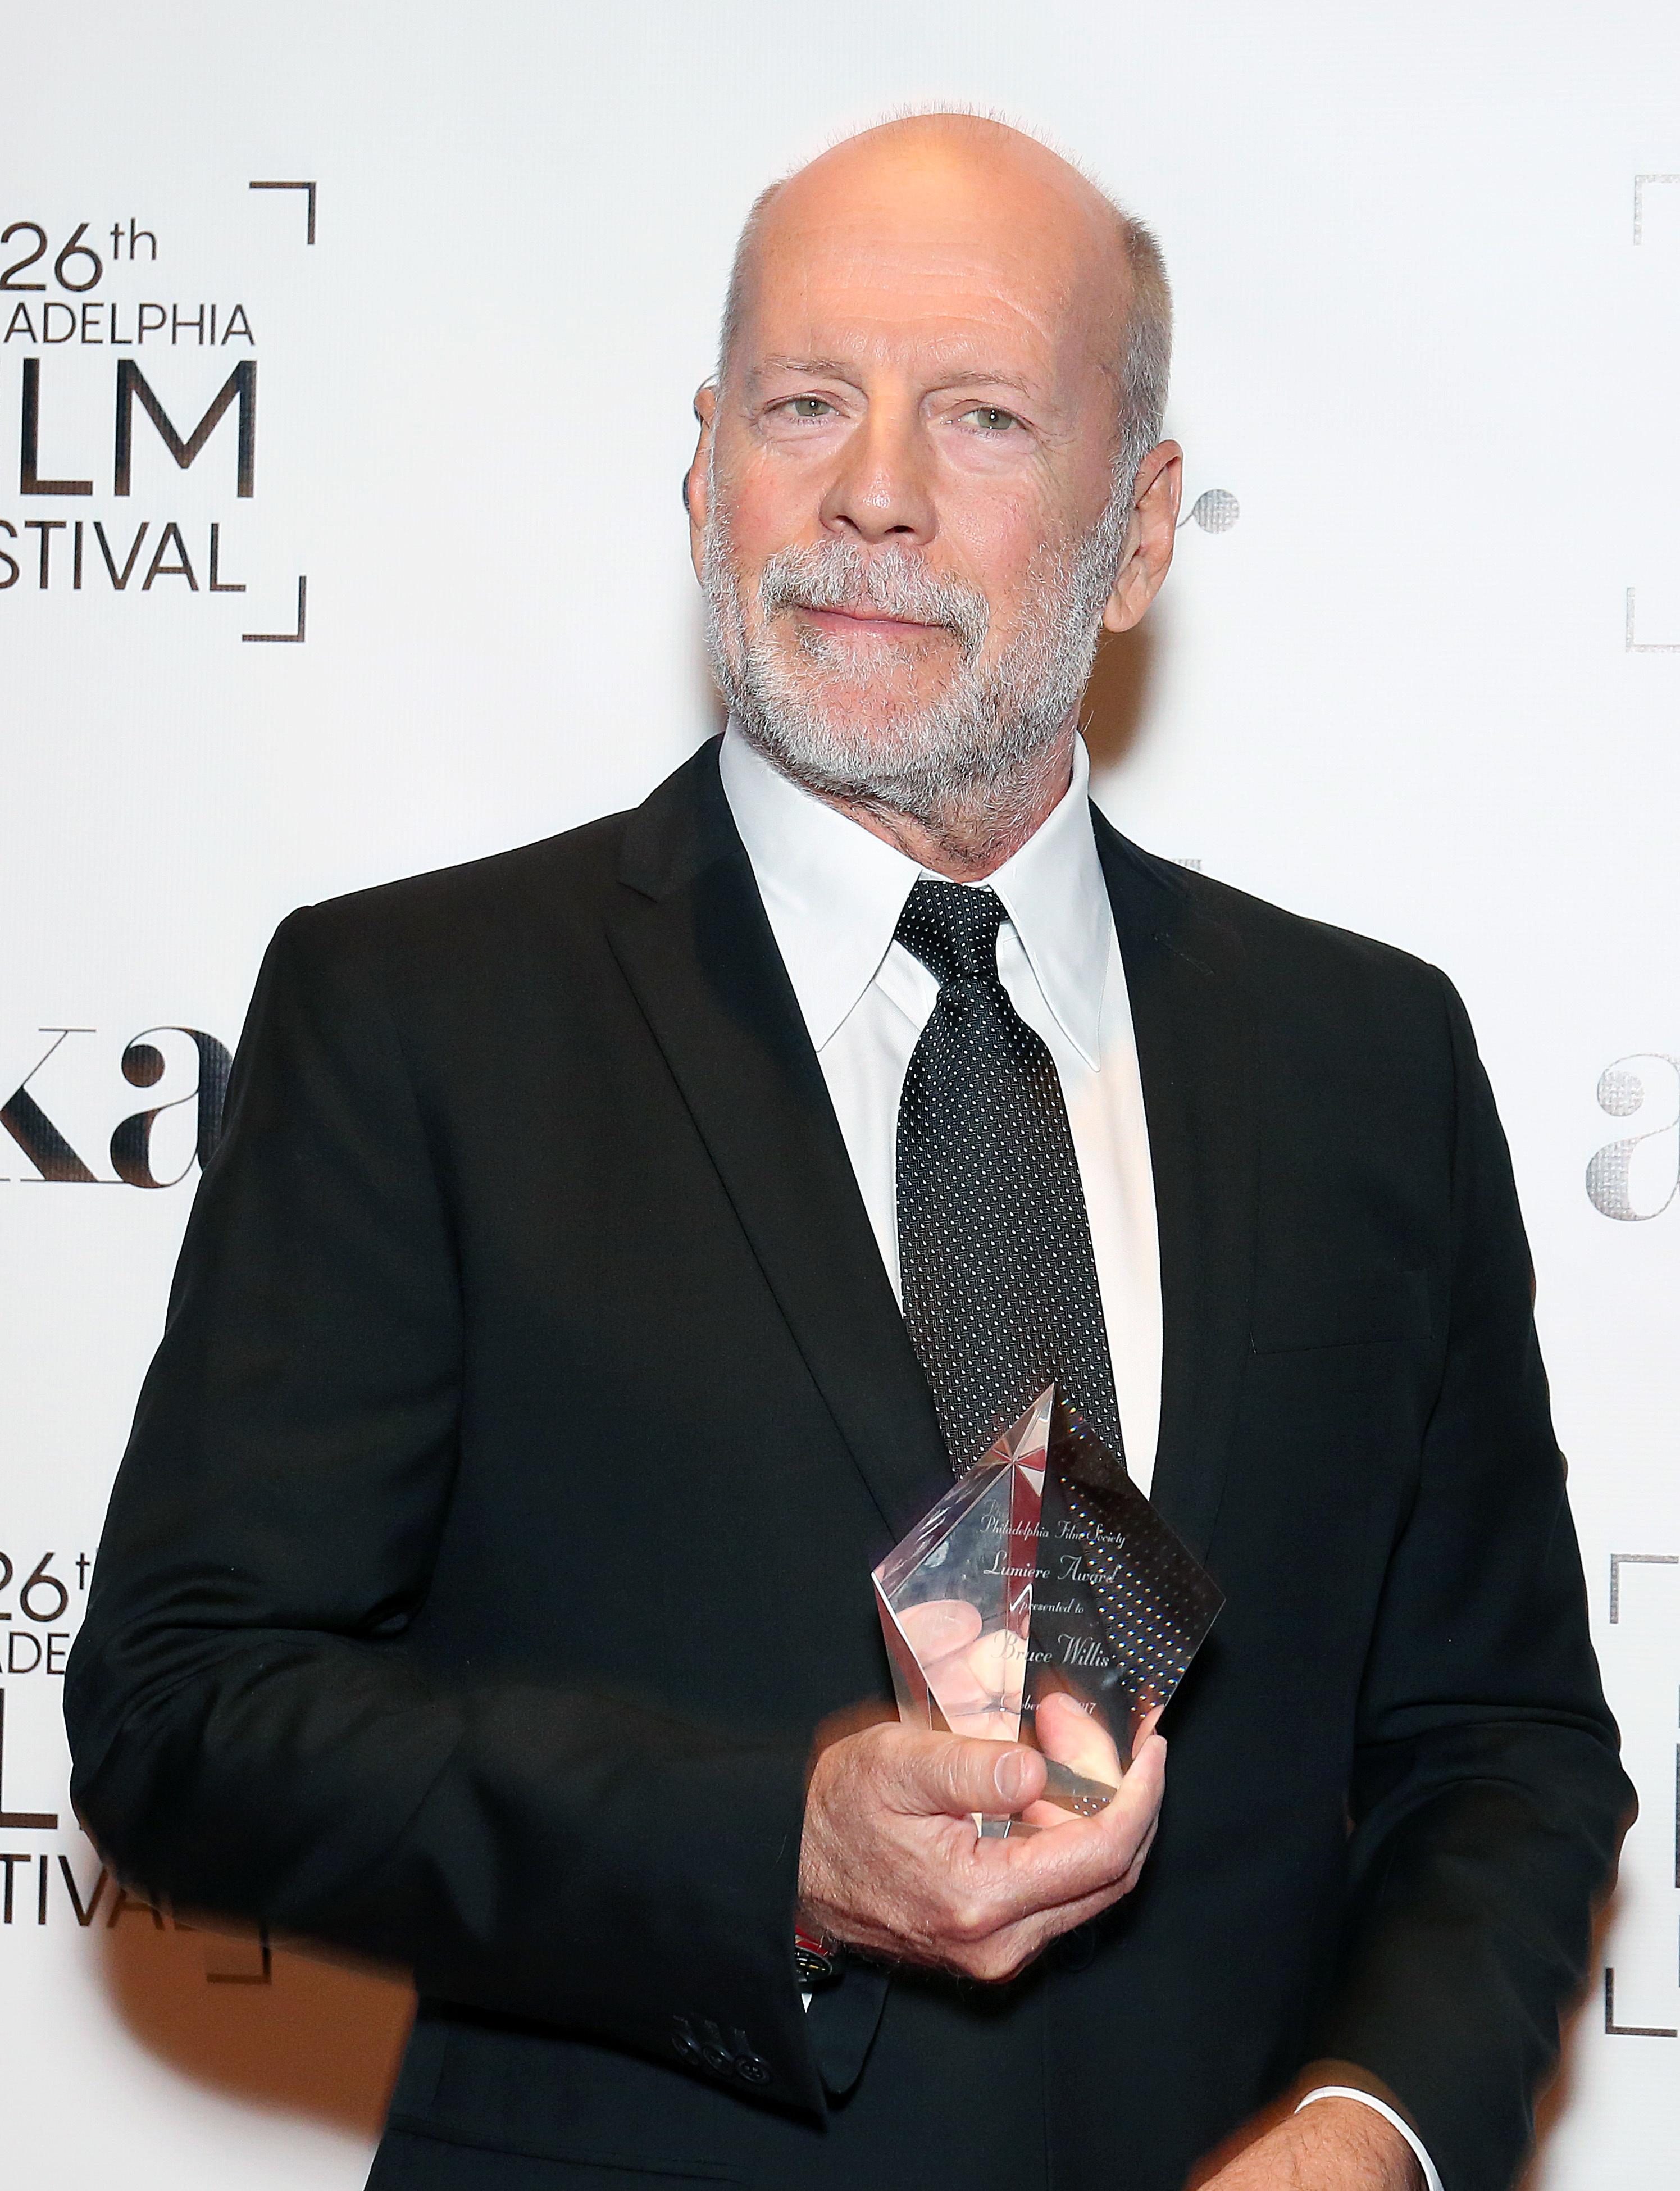 Bruce Willis attends the Luminere Awards in Philadelphia on Oct. 26, 2017.